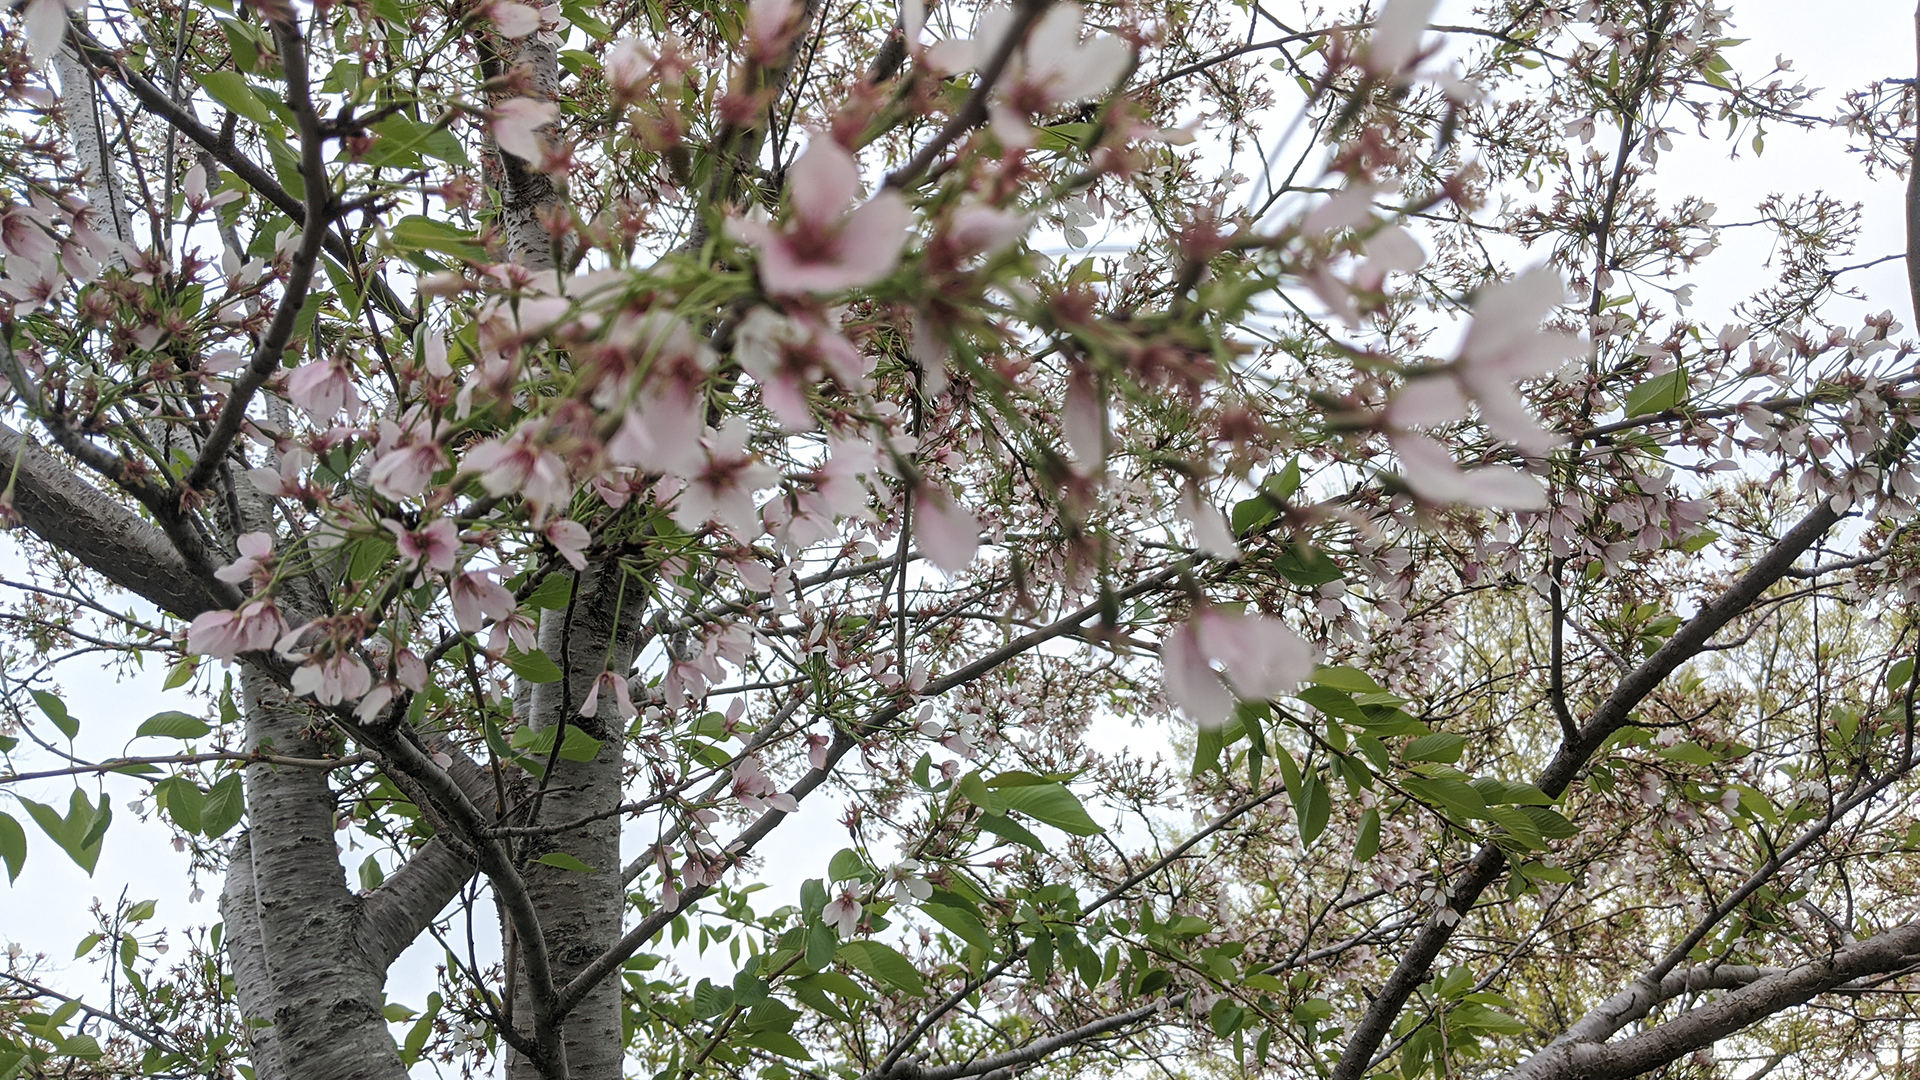 5/13/20 Jackson Park Cherry Blossoms 2